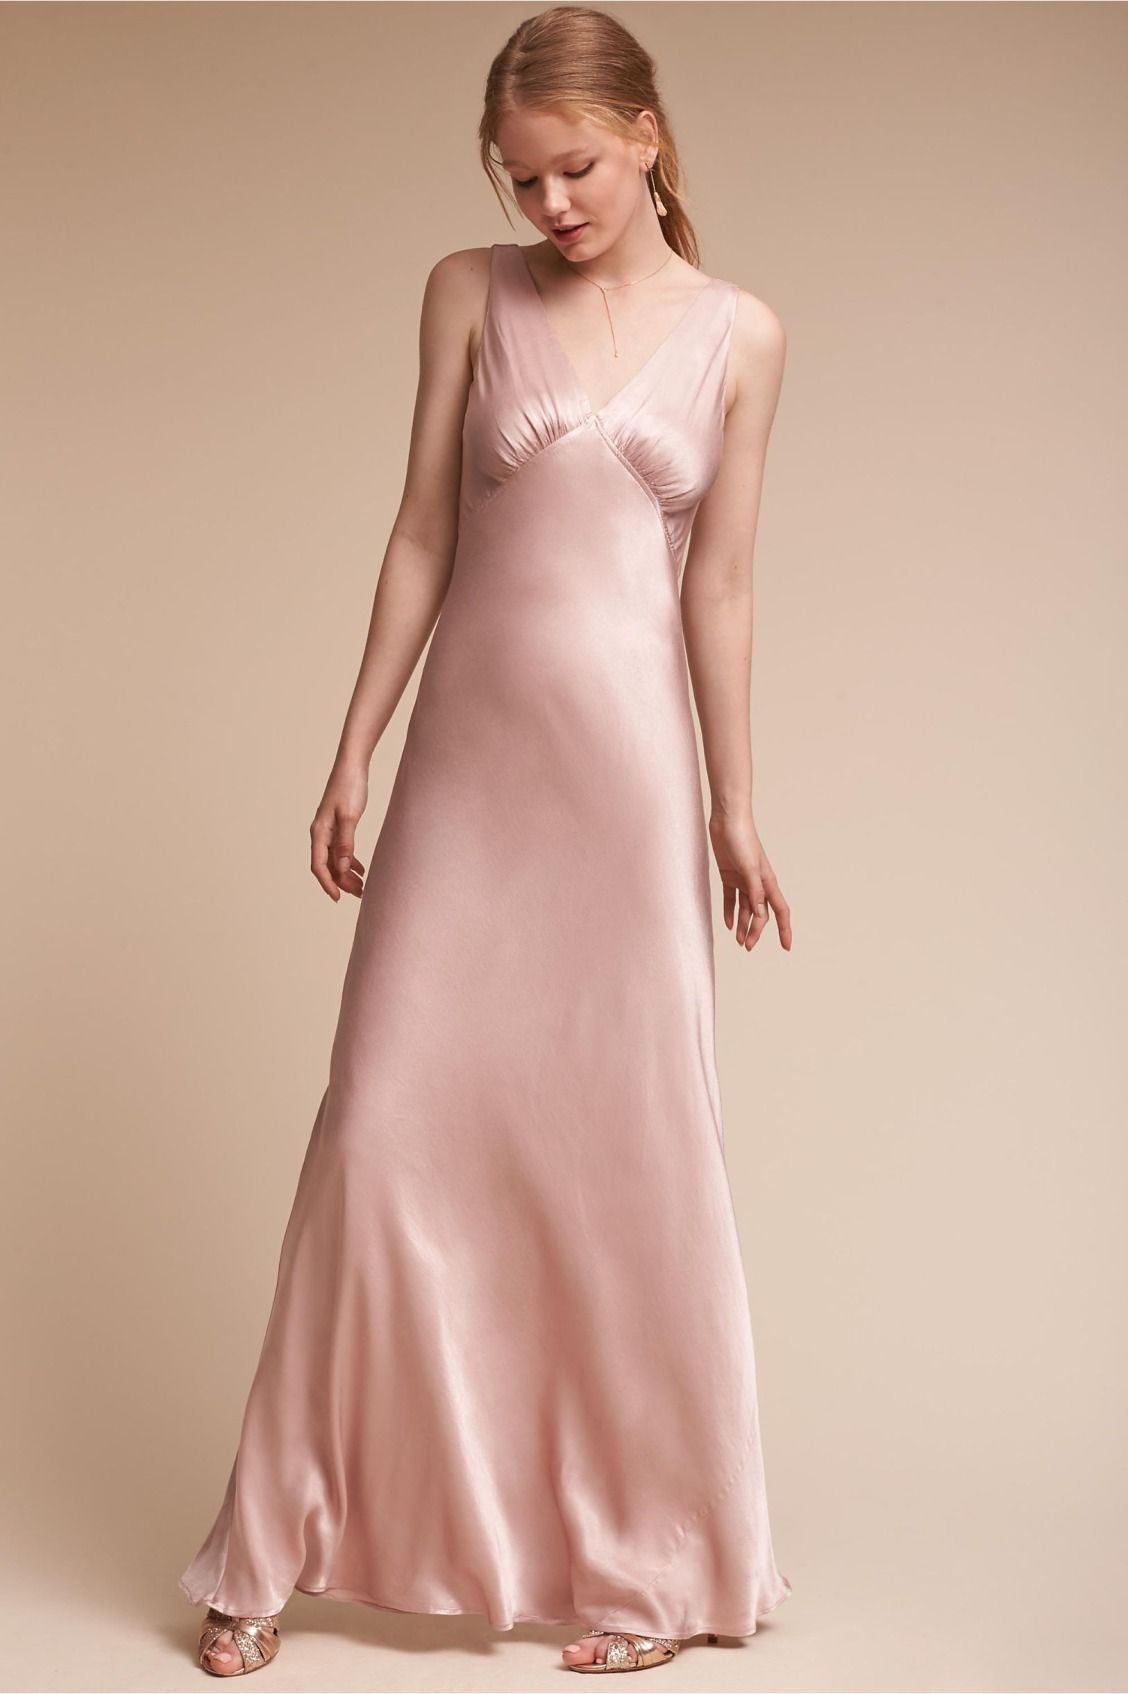 Luster Dress